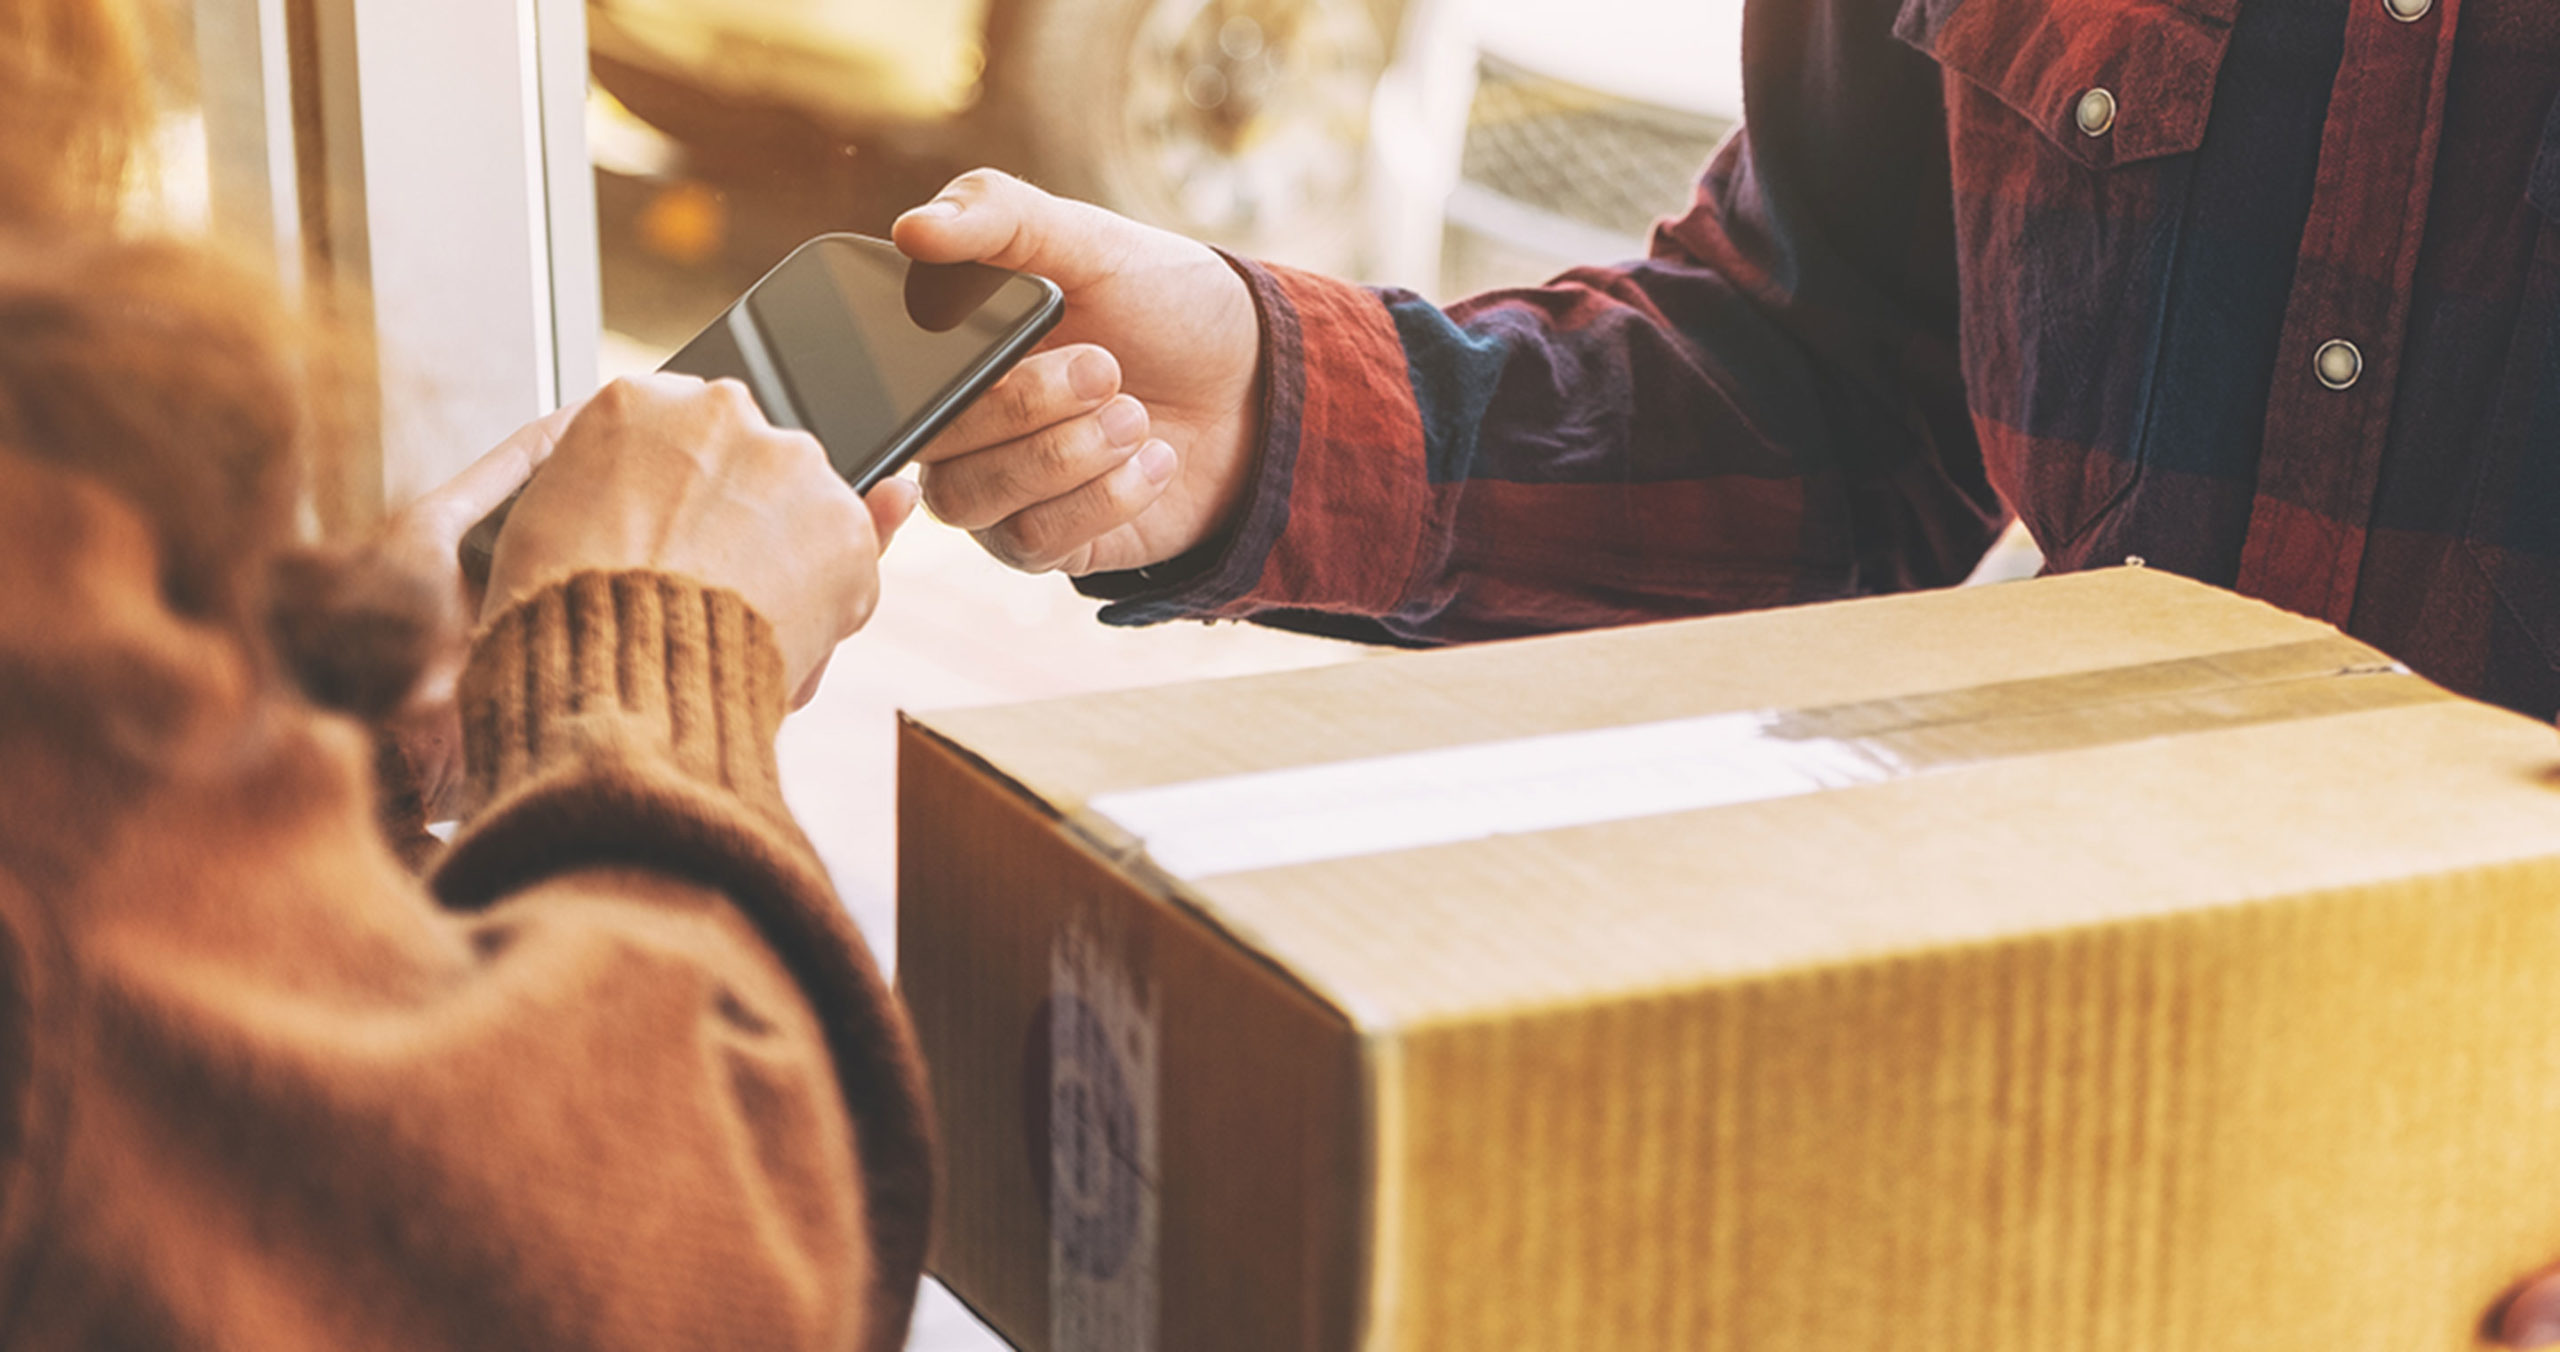 Magento Order Management speeds up fulfillment process